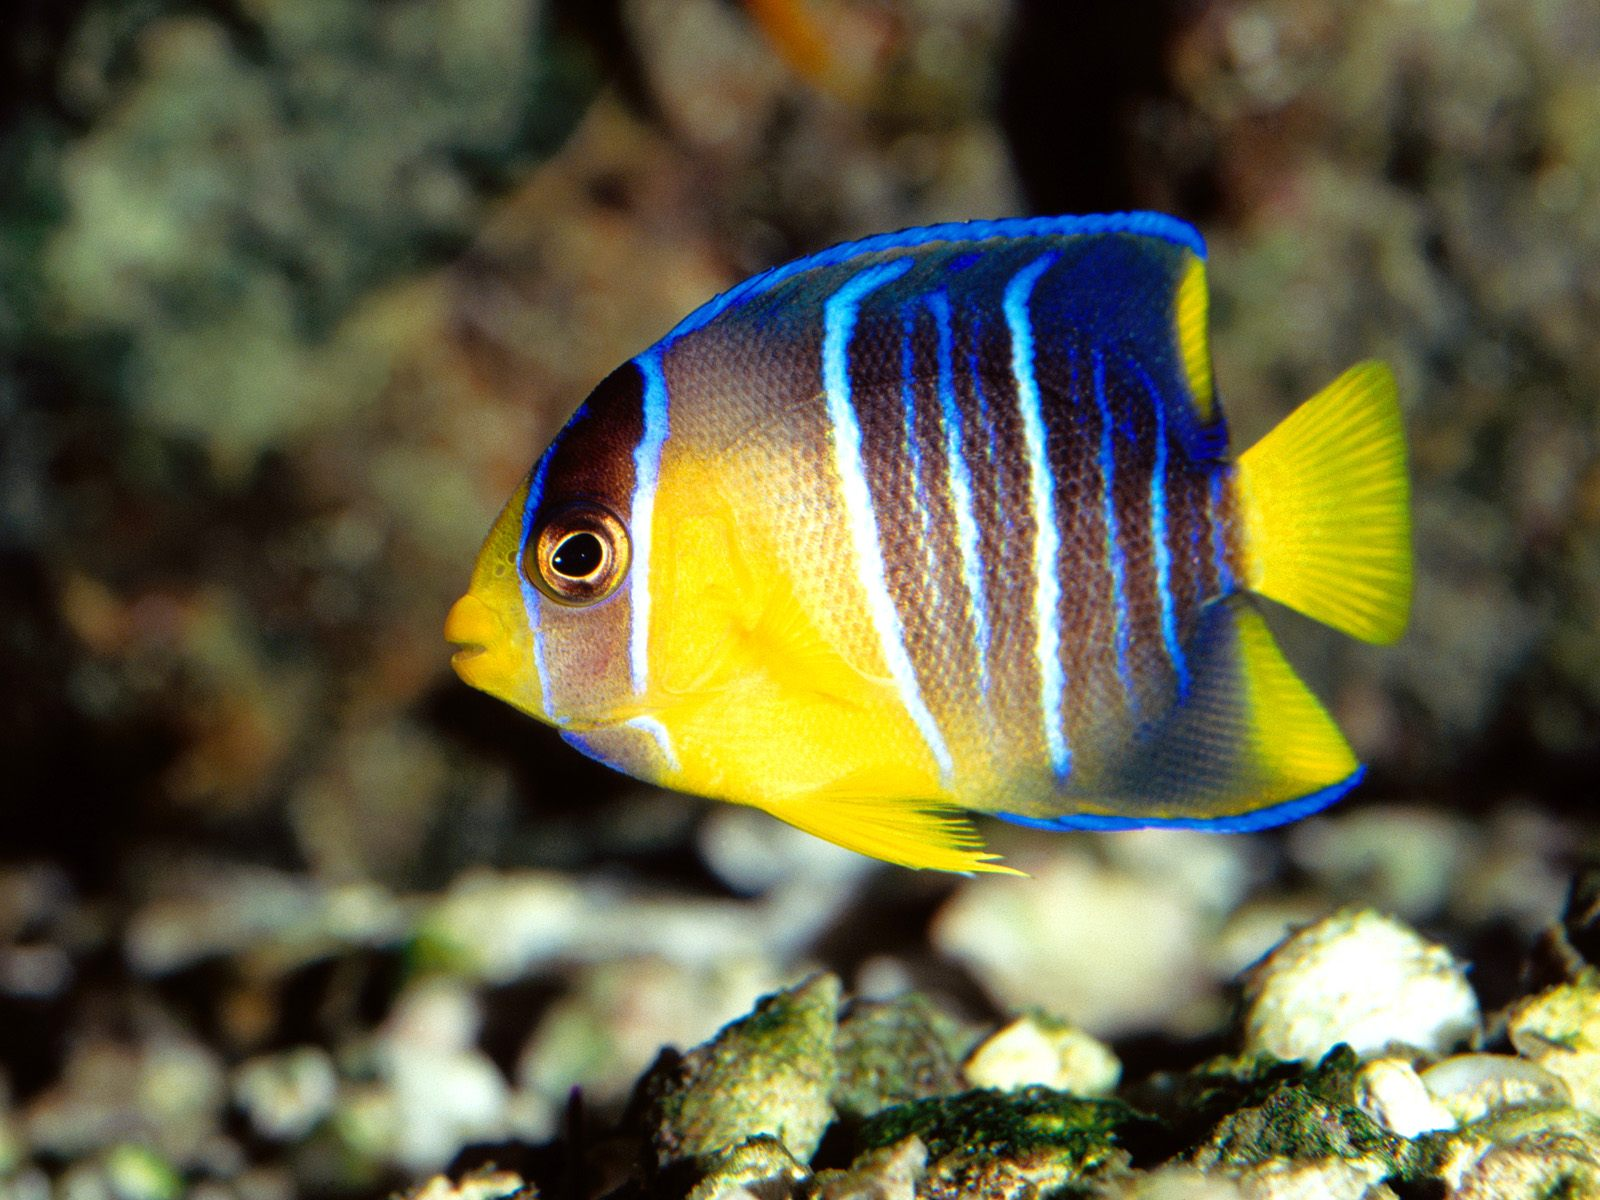 Angel fish photo